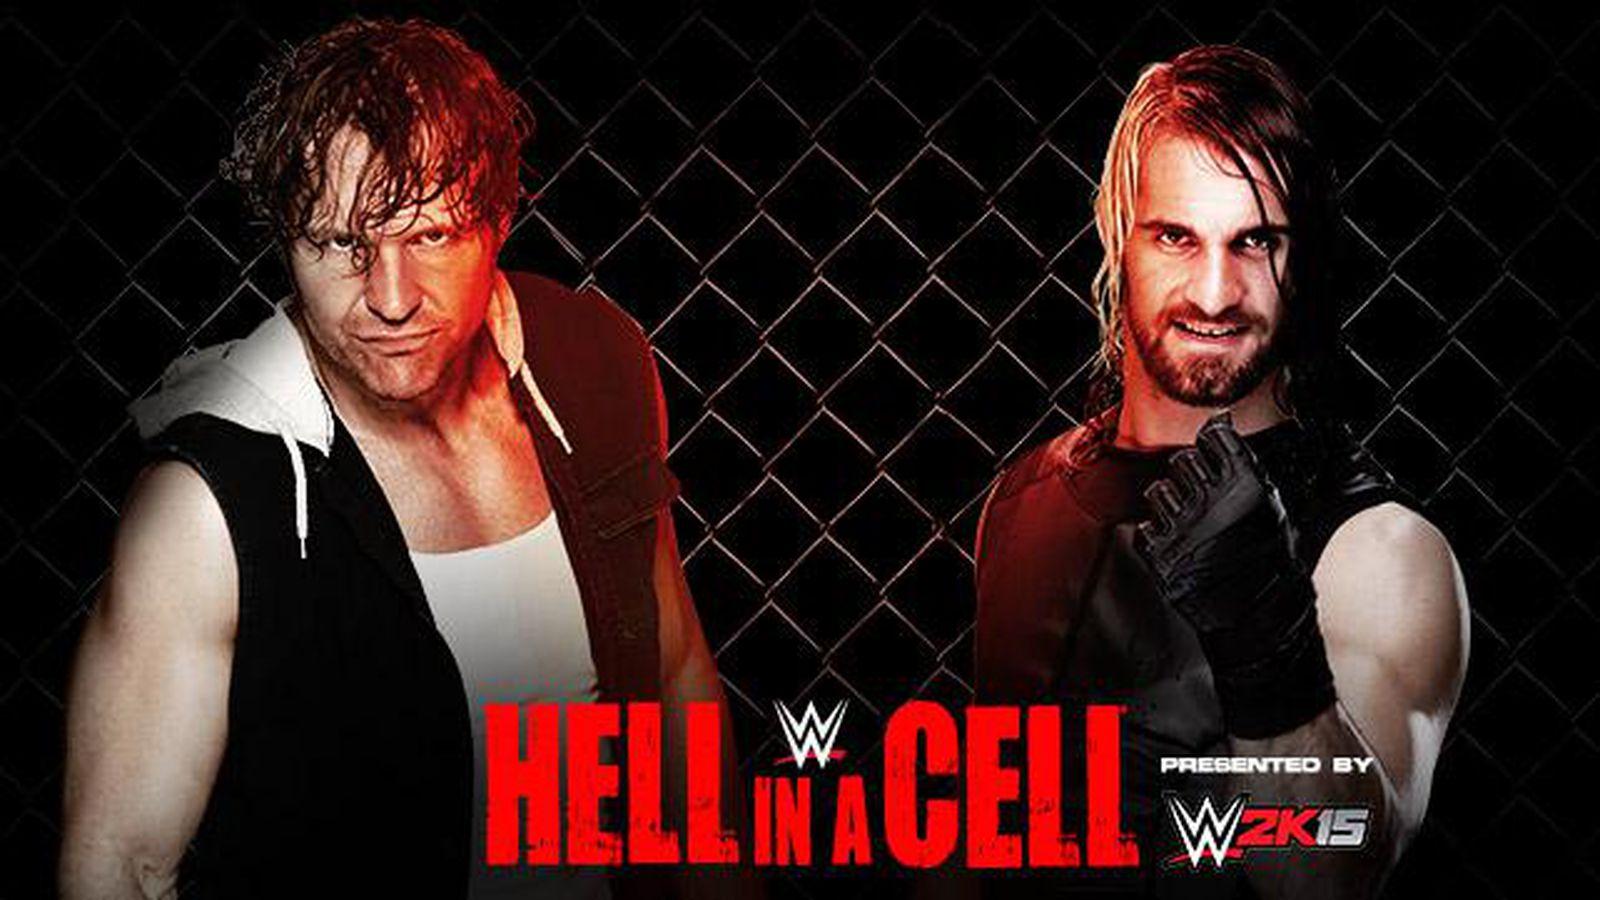 Znalezione obrazy dla zapytania Hell in a Cell 2014 Seth Rollins (w/Jamie Noble & Joey Mercury) vs. Dean Ambrose